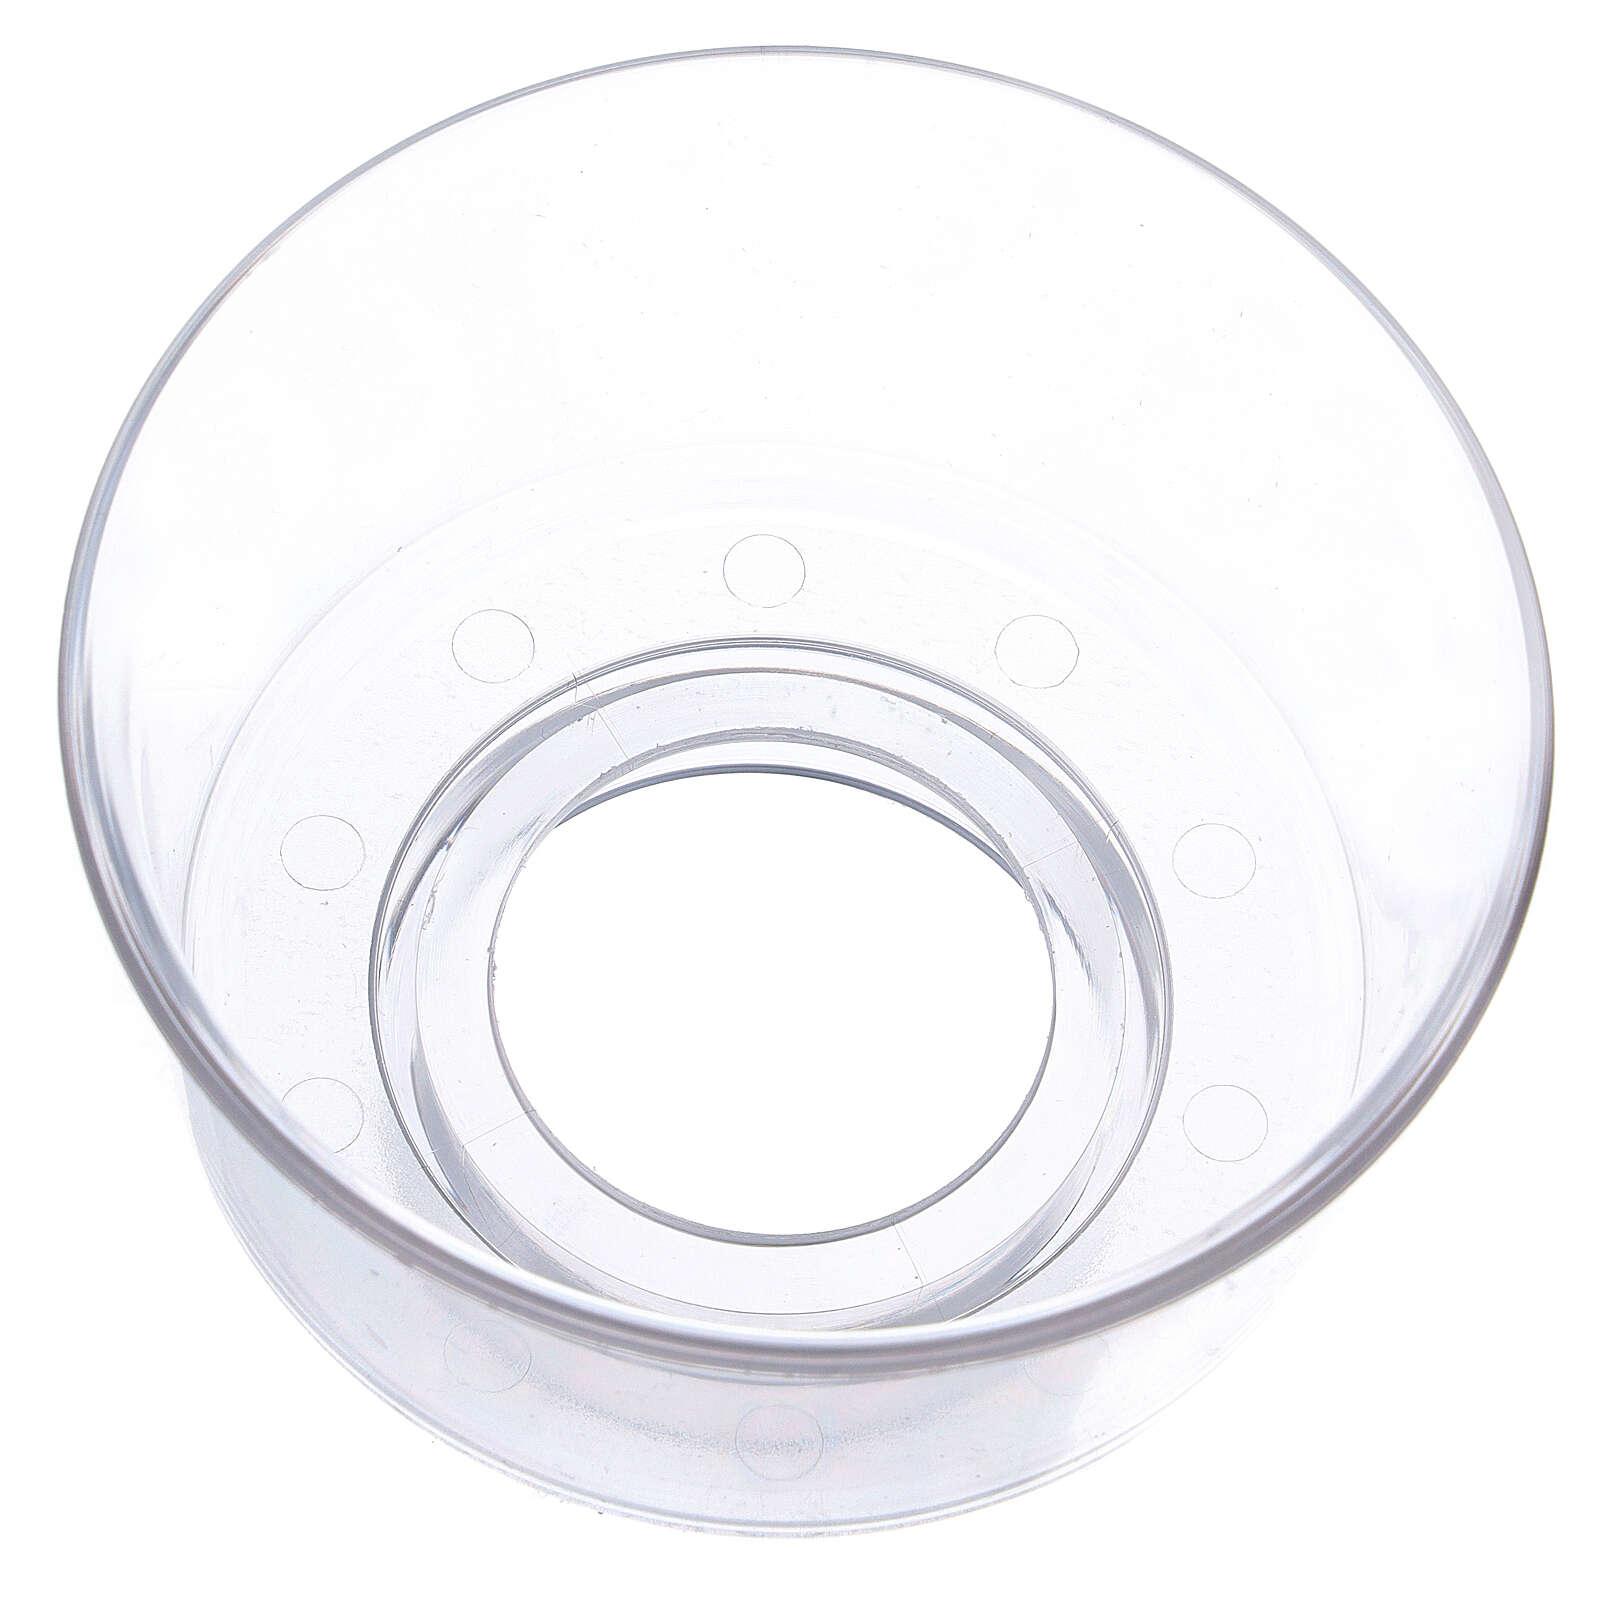 Protège-flamme en verre diam. 5 cm 3